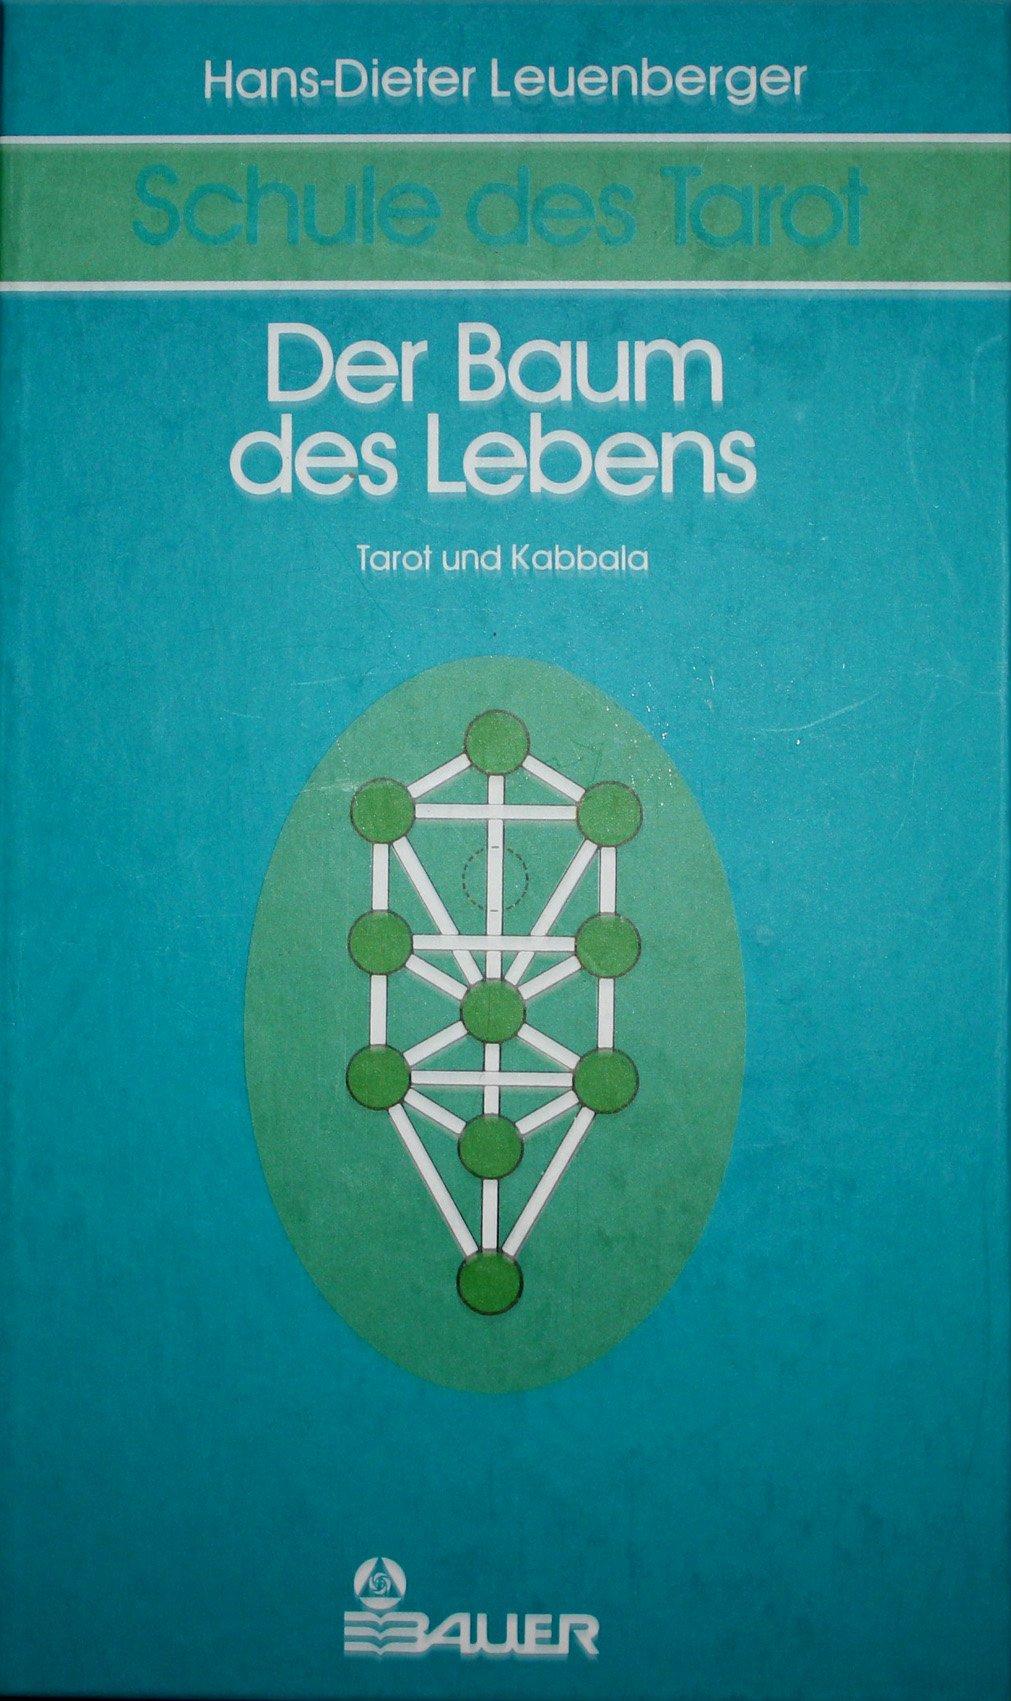 Schule des Tarot II: Der Baum des Lebens. Tarot und Kabbala Gebundenes Buch – Januar 1997 Hans-Dieter Leuenberger Hermann Bauer 3762602441 MAK_new_usd__9783762602446